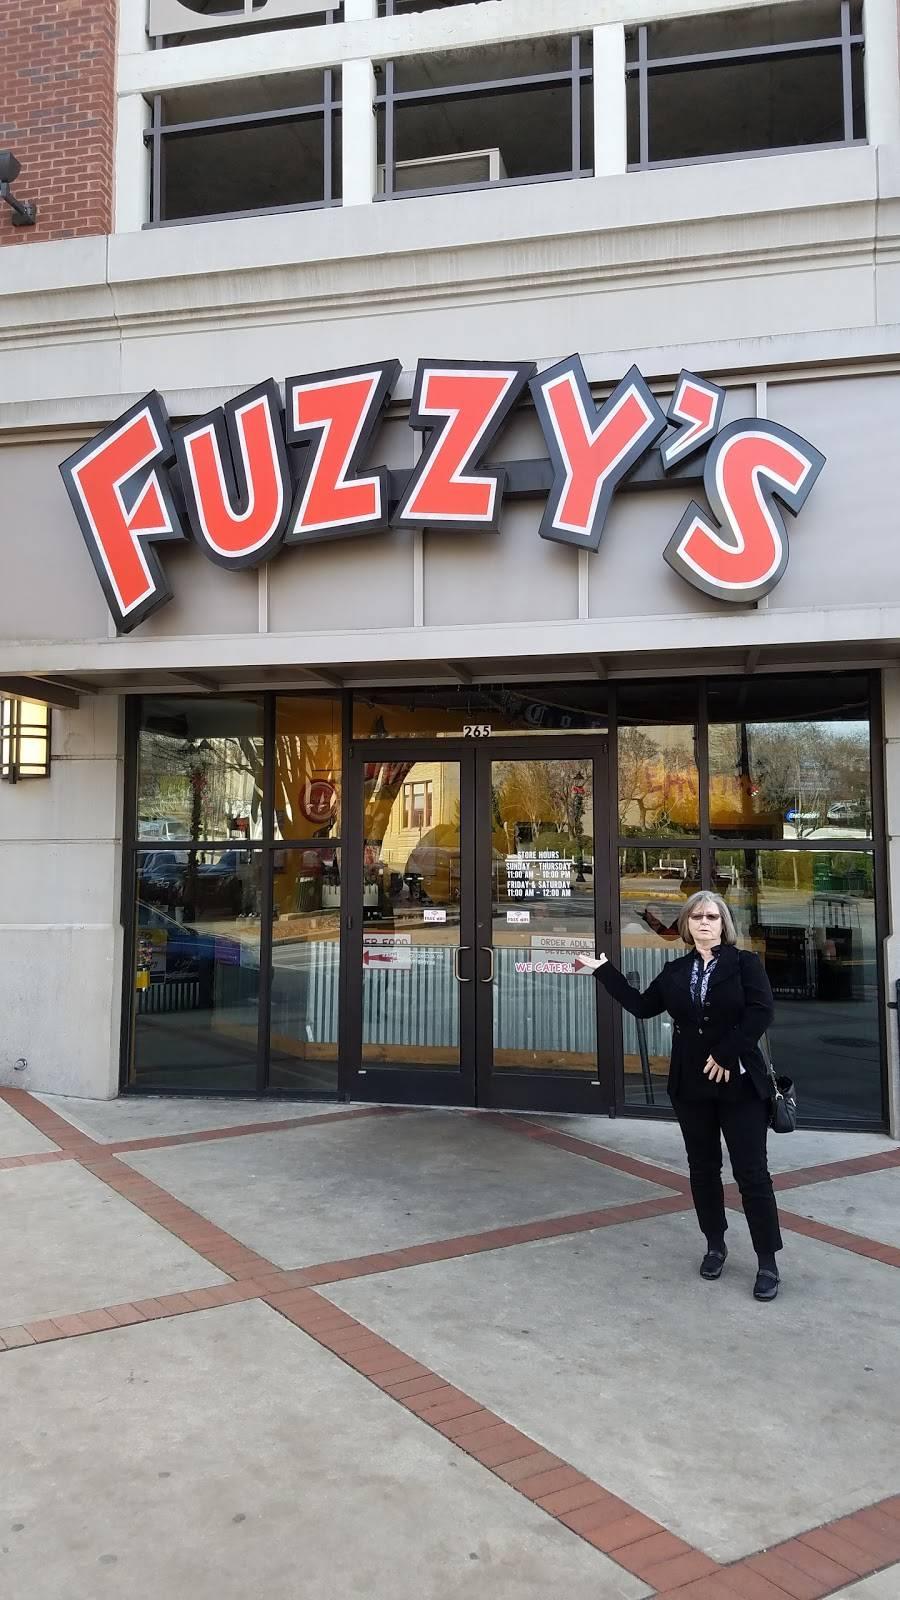 Fuzzys Taco Shop   restaurant   265 N Lumpkin St, Athens, GA 30601, USA   7063530305 OR +1 706-353-0305